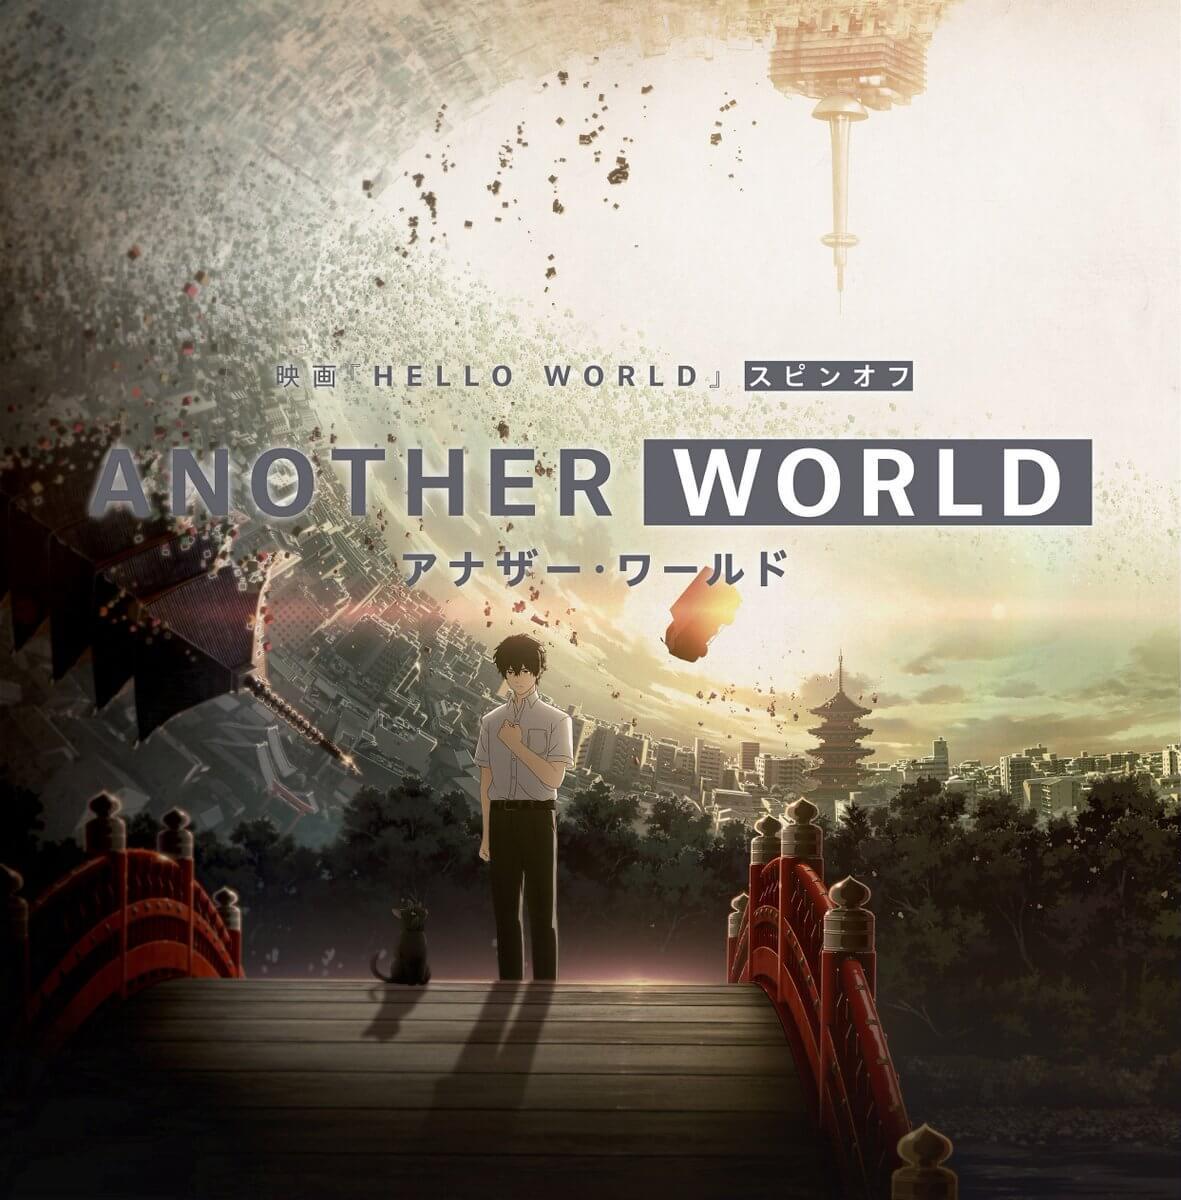 Hello World بلوراي 1080P أون لاين مترجم عربي تحميل و مشاهدة مباشرة